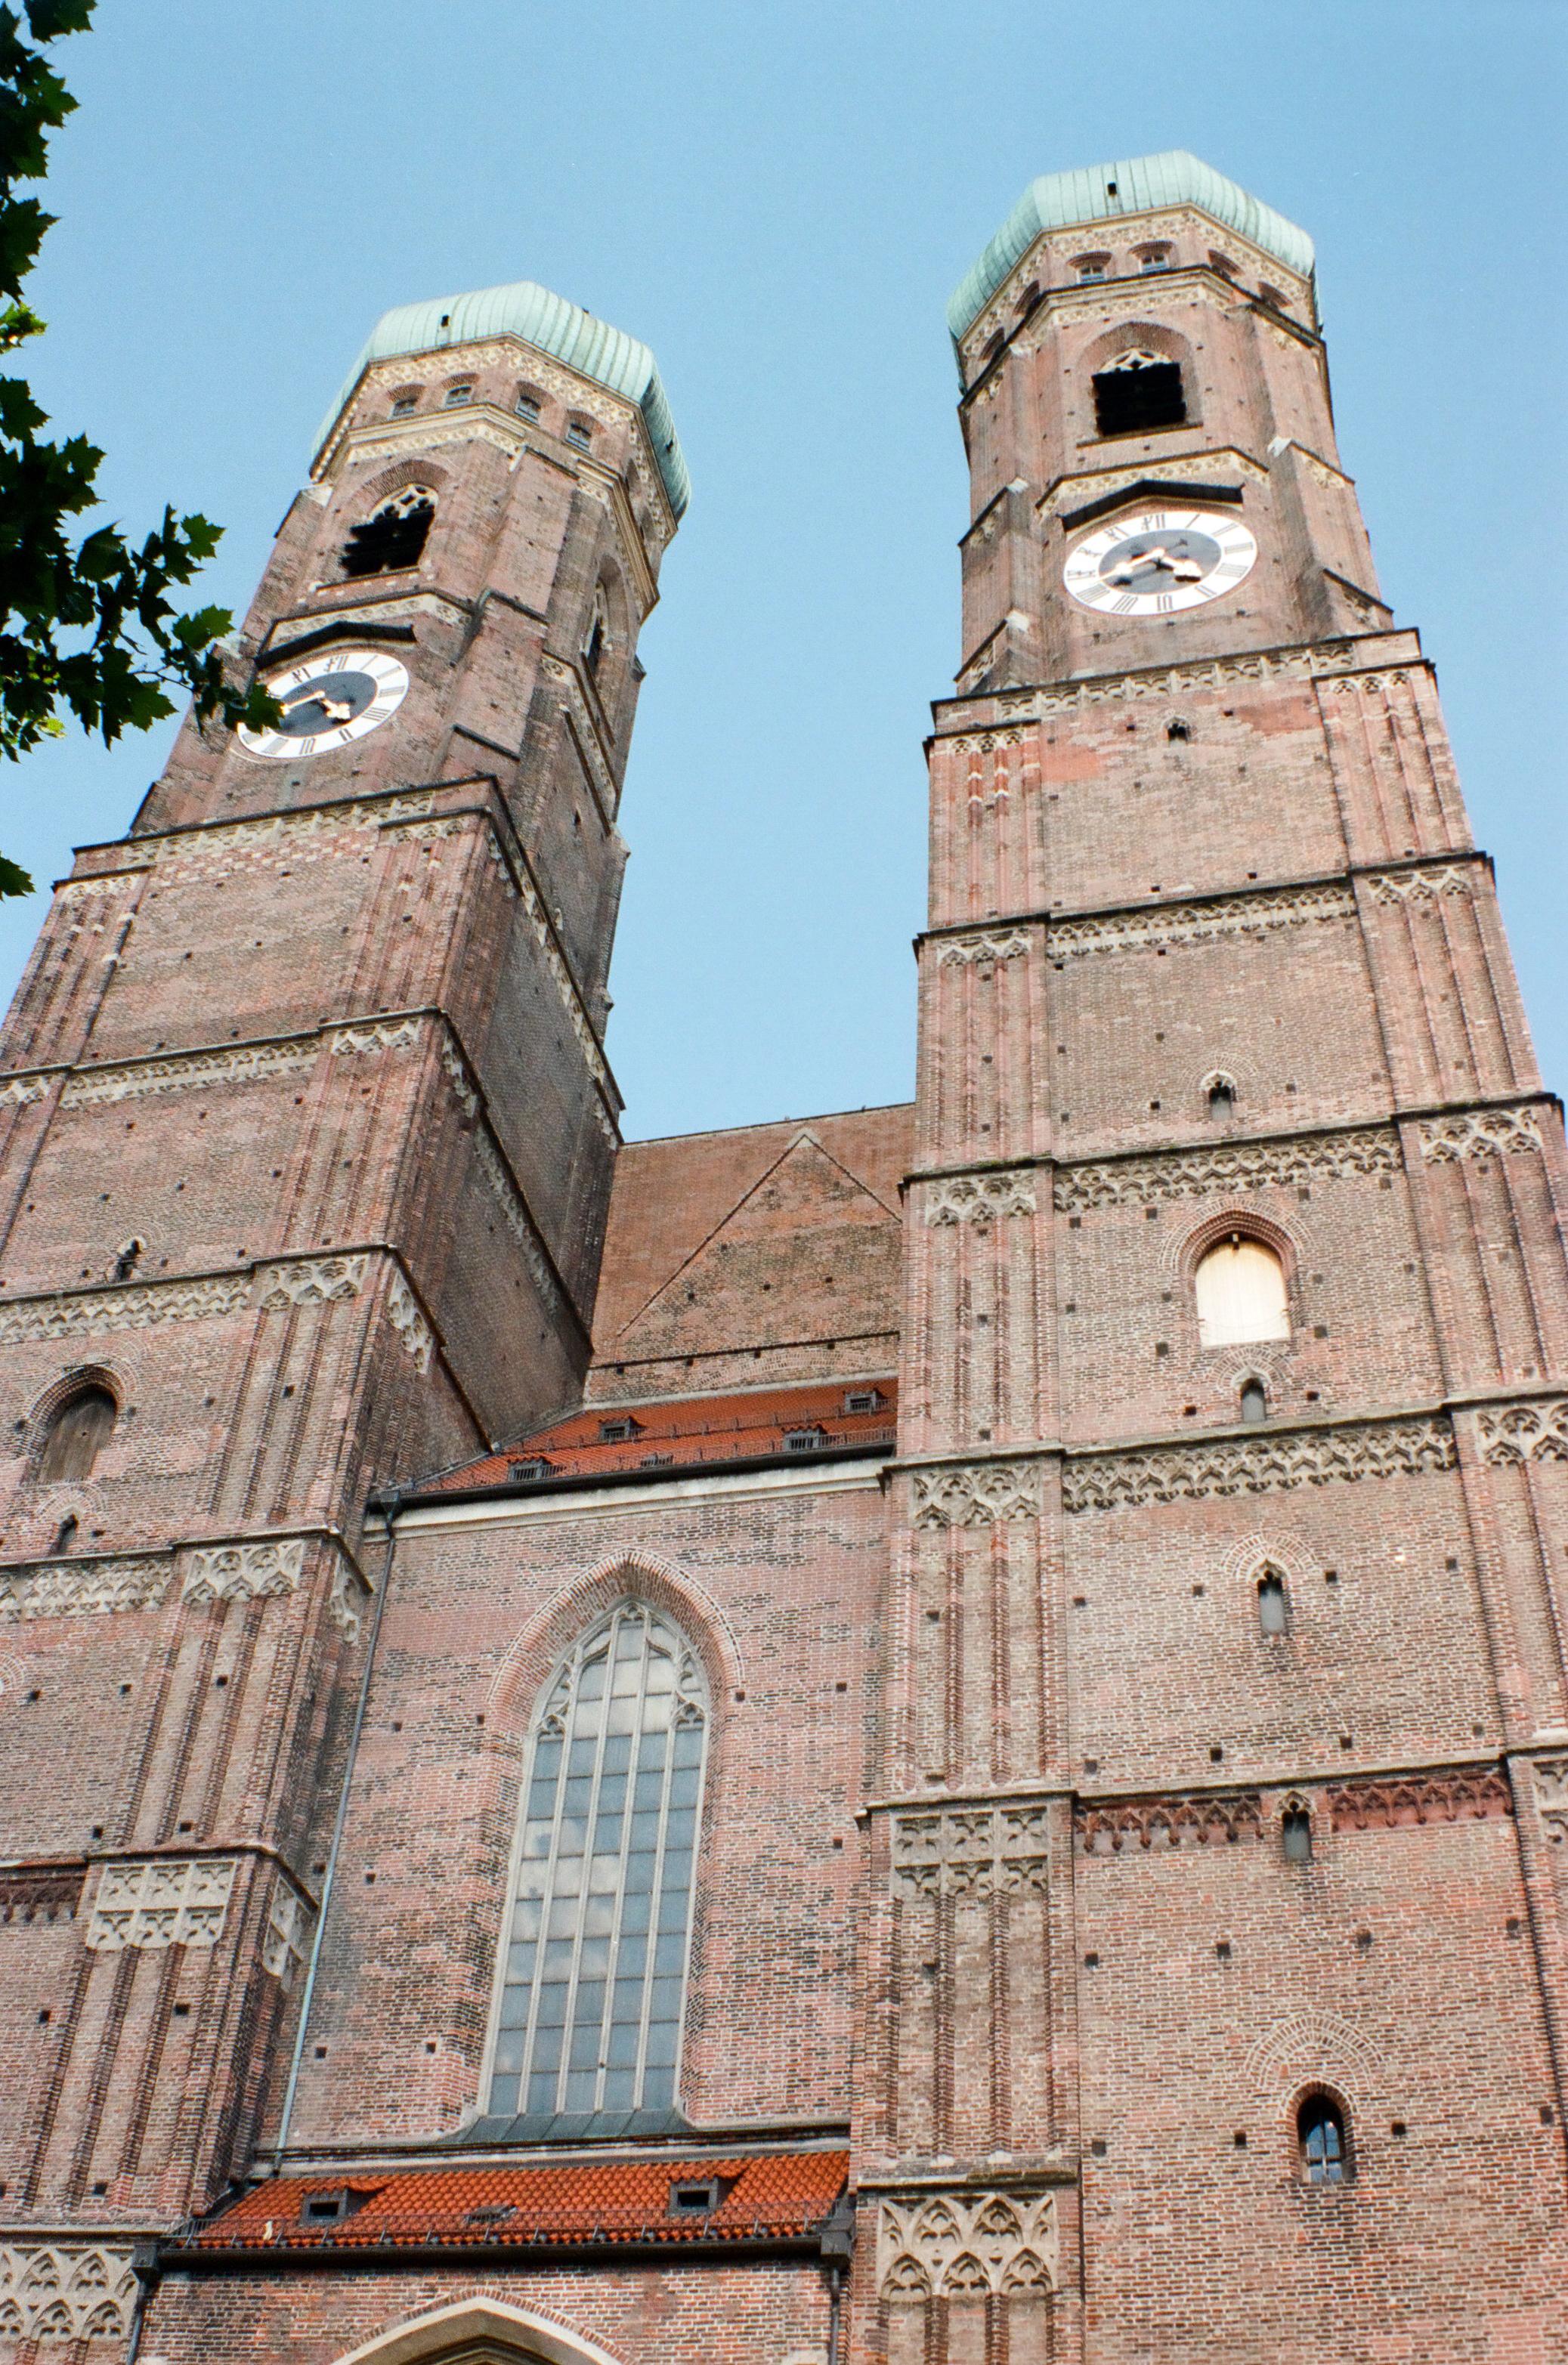 Church of Our Lady, Munich